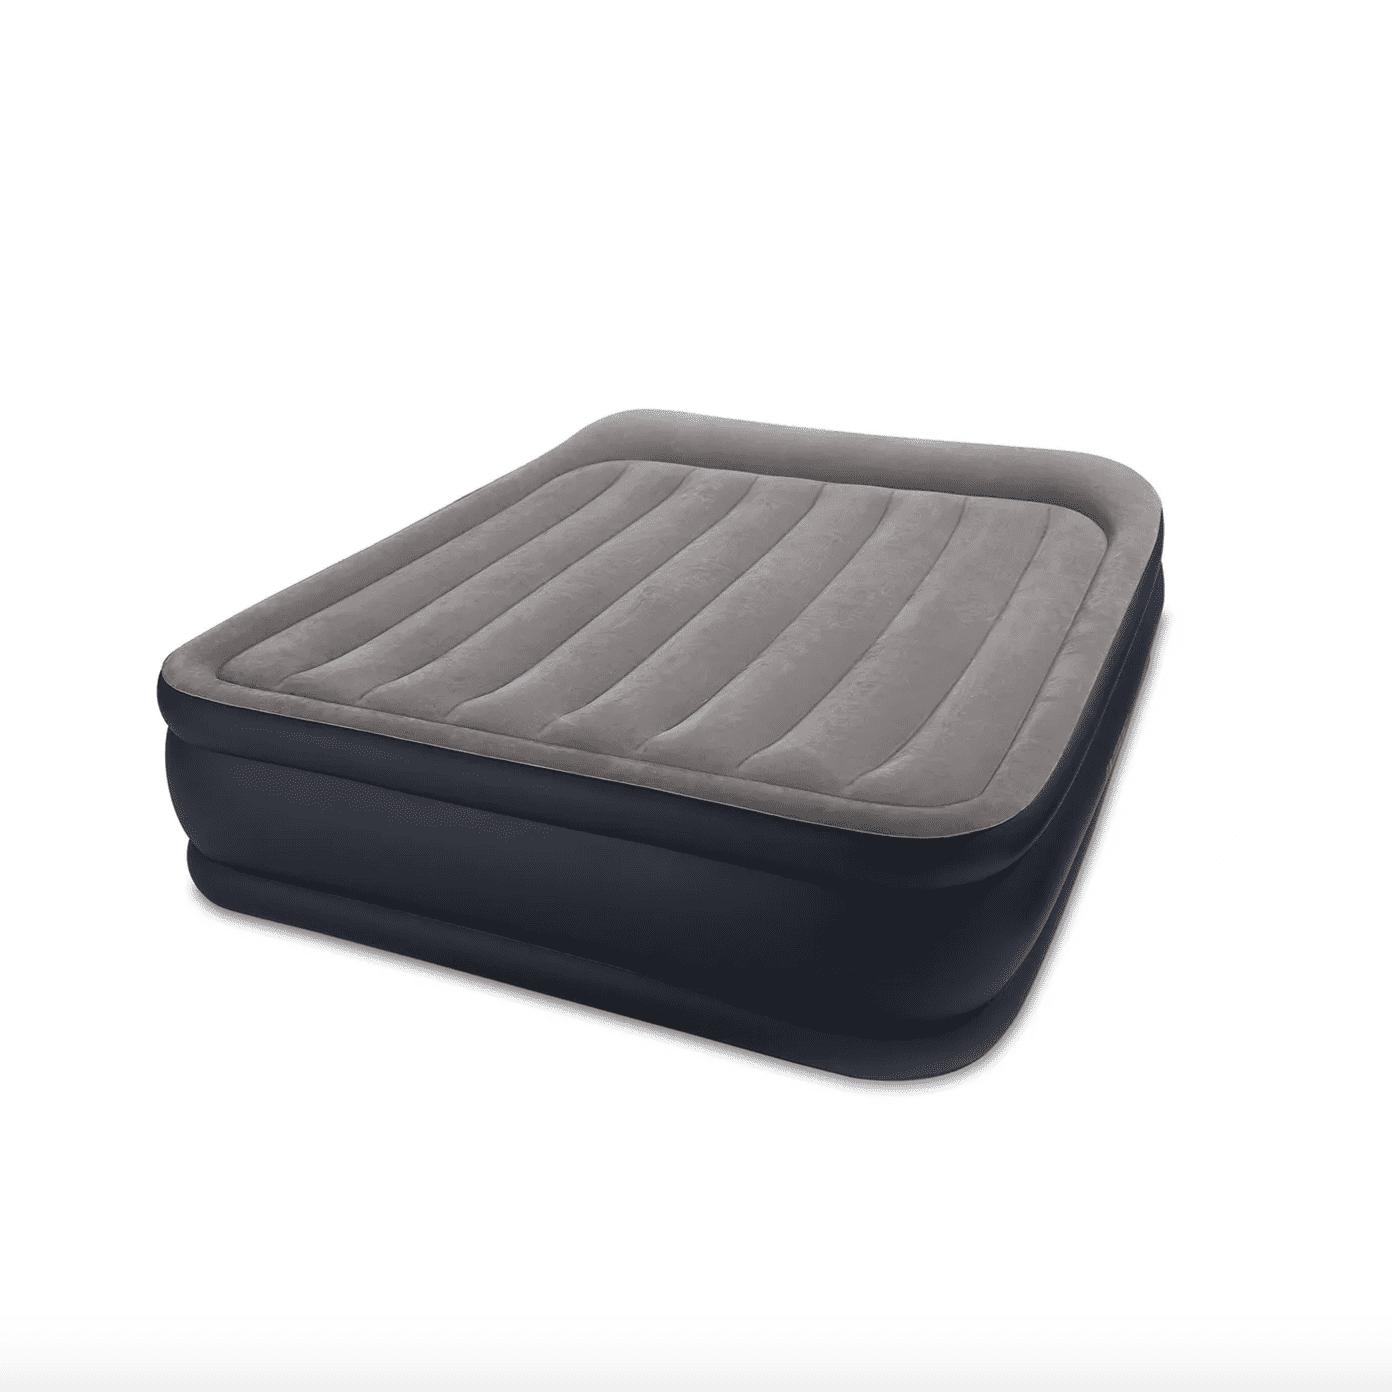 Intex Deluxe Pillow Rest Raised Blow Up Air Bed Mattress